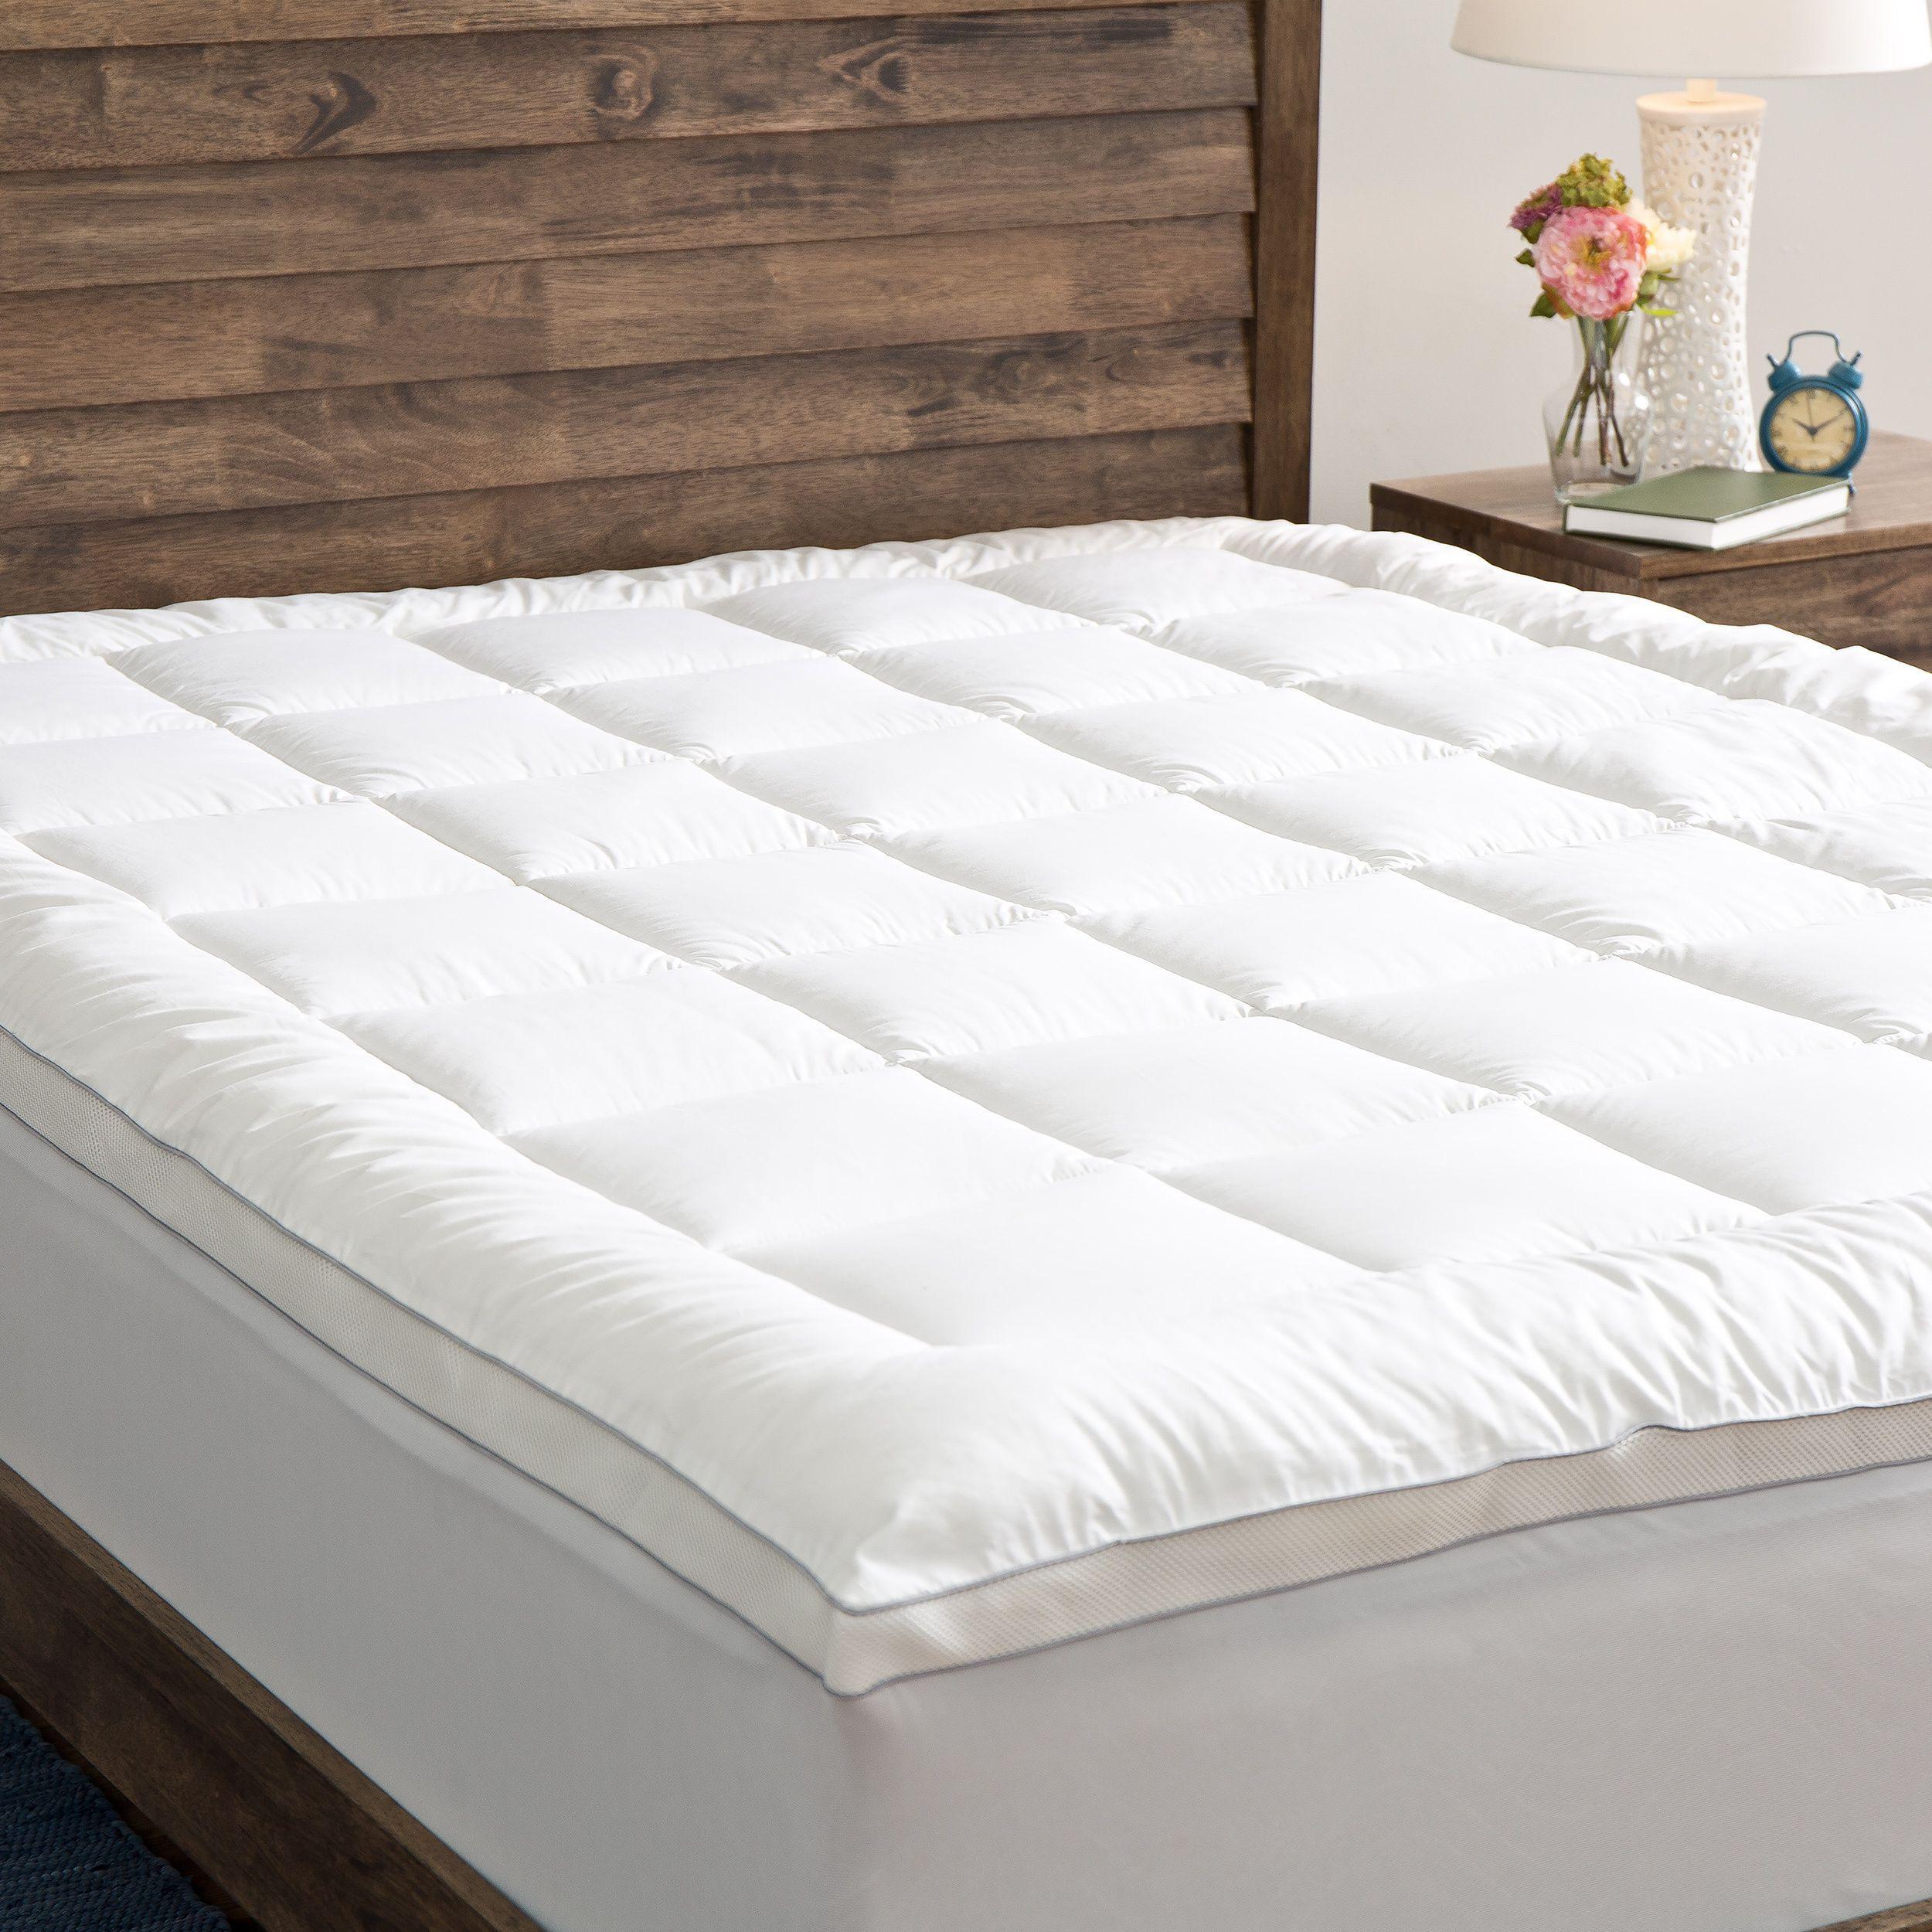 essentials set bed ca mattress complete completebedset silk en sets covers